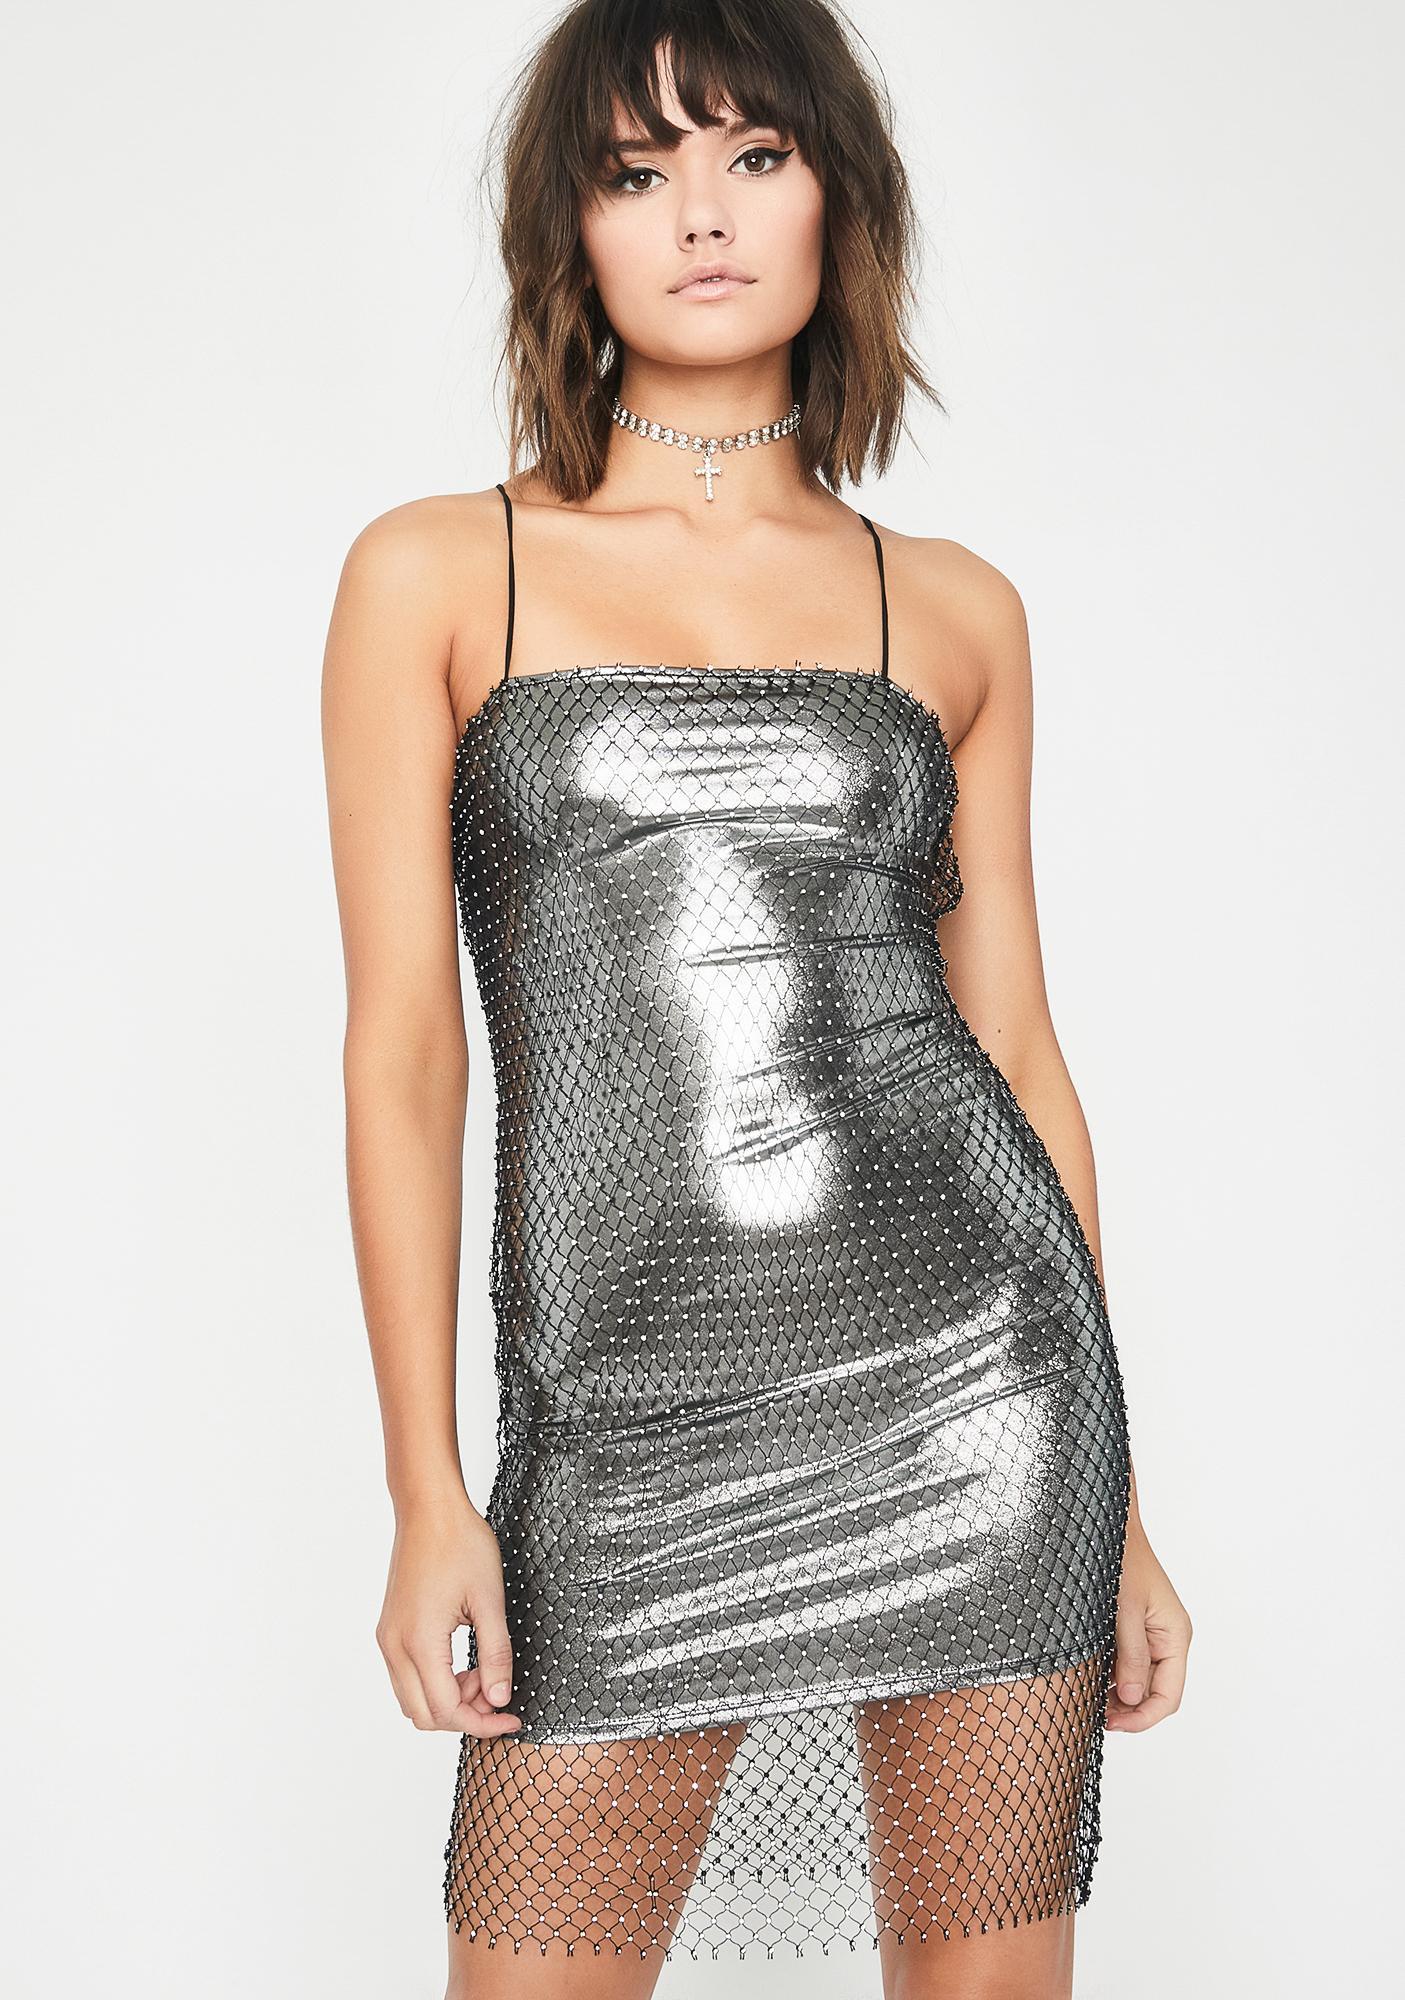 772602ad0b7 Rhinestone Overlay Liquid Mini Dress